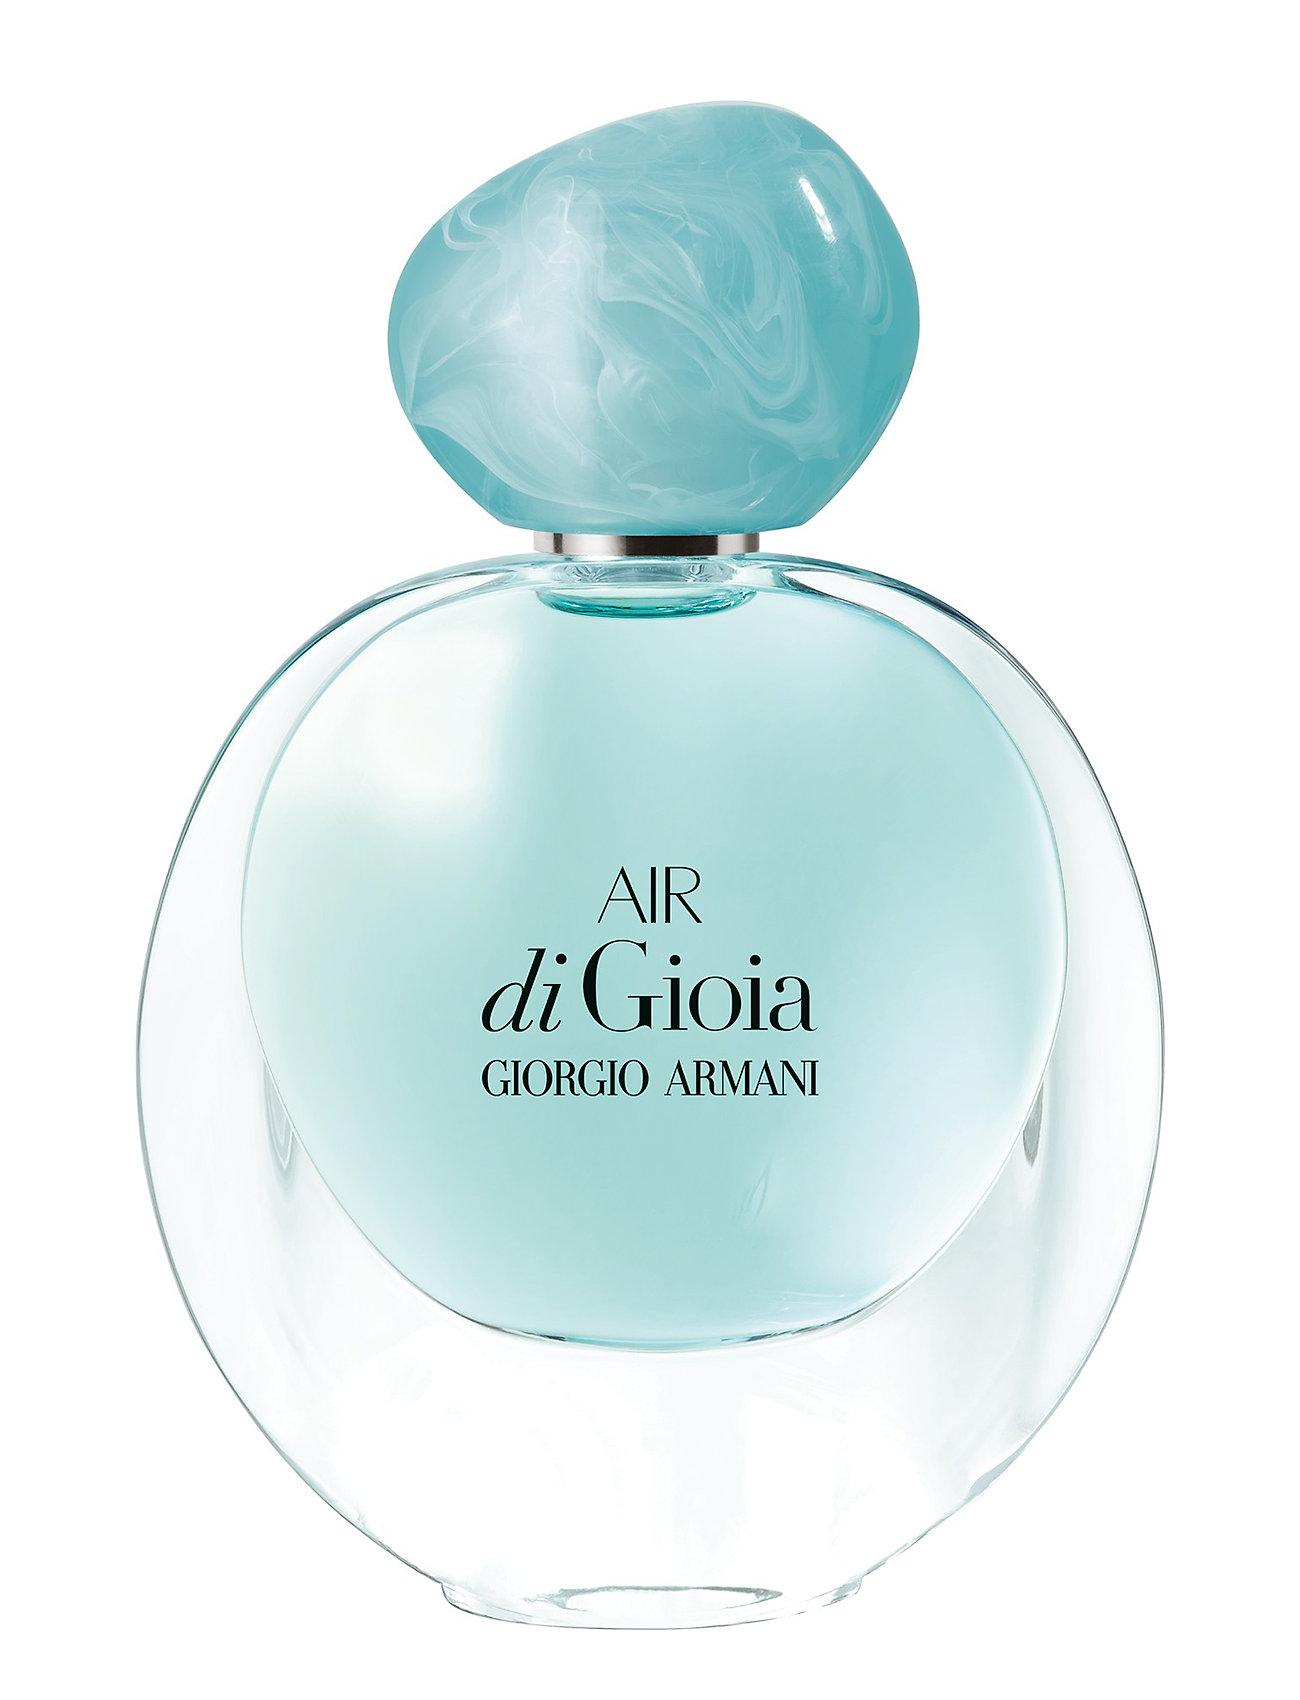 giorgio armani Air di gioia eau de parfum 30 ml på boozt.com dk